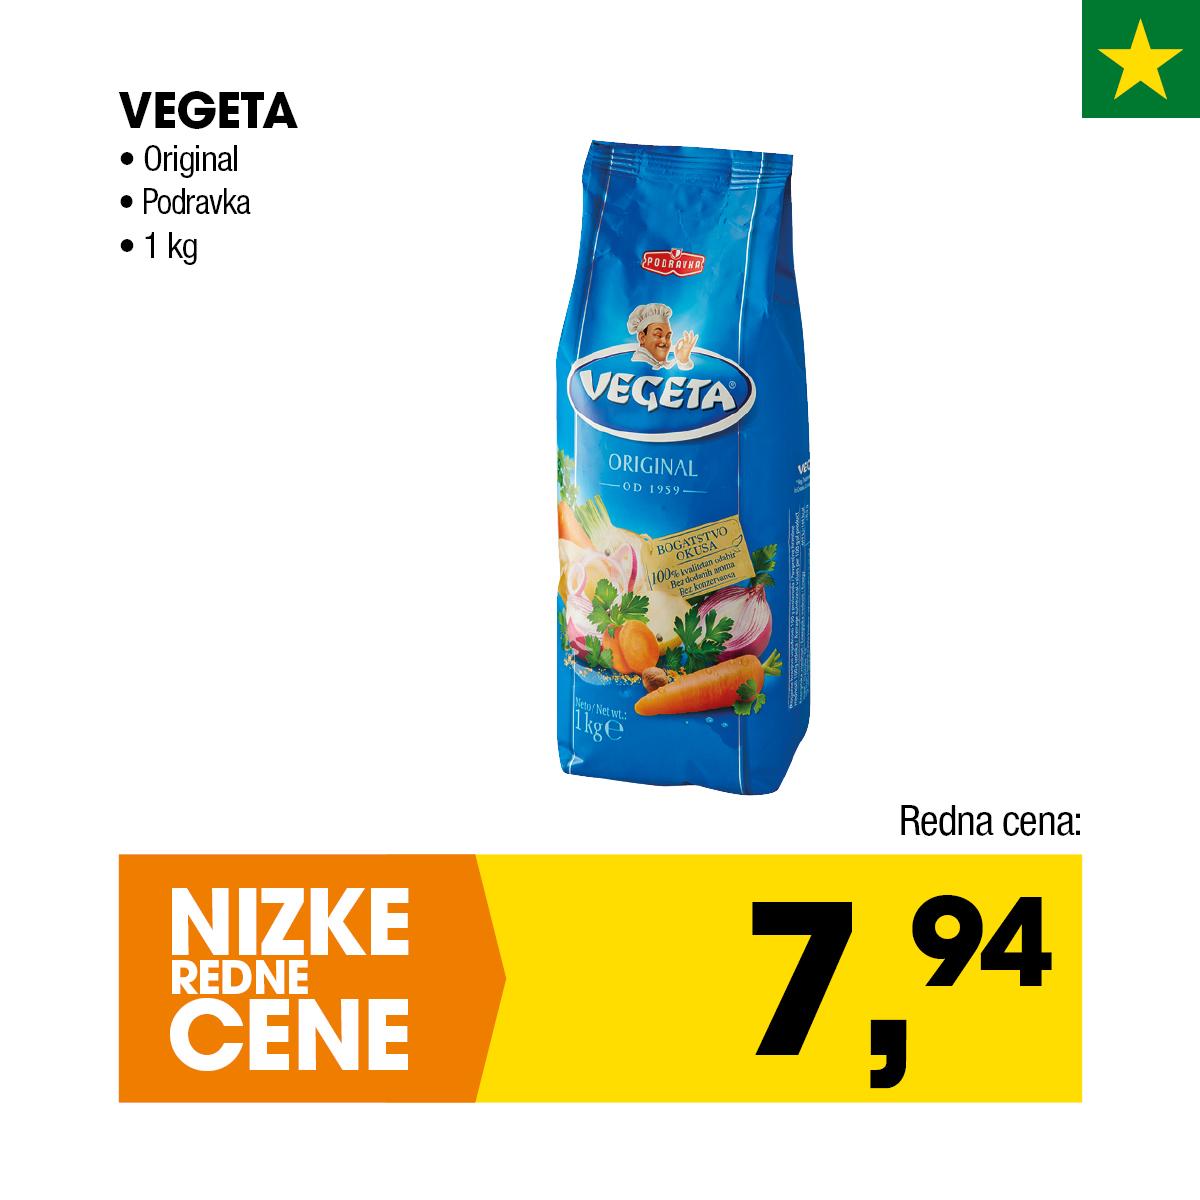 Nizke cene - Vegeta original Podravka 1kg